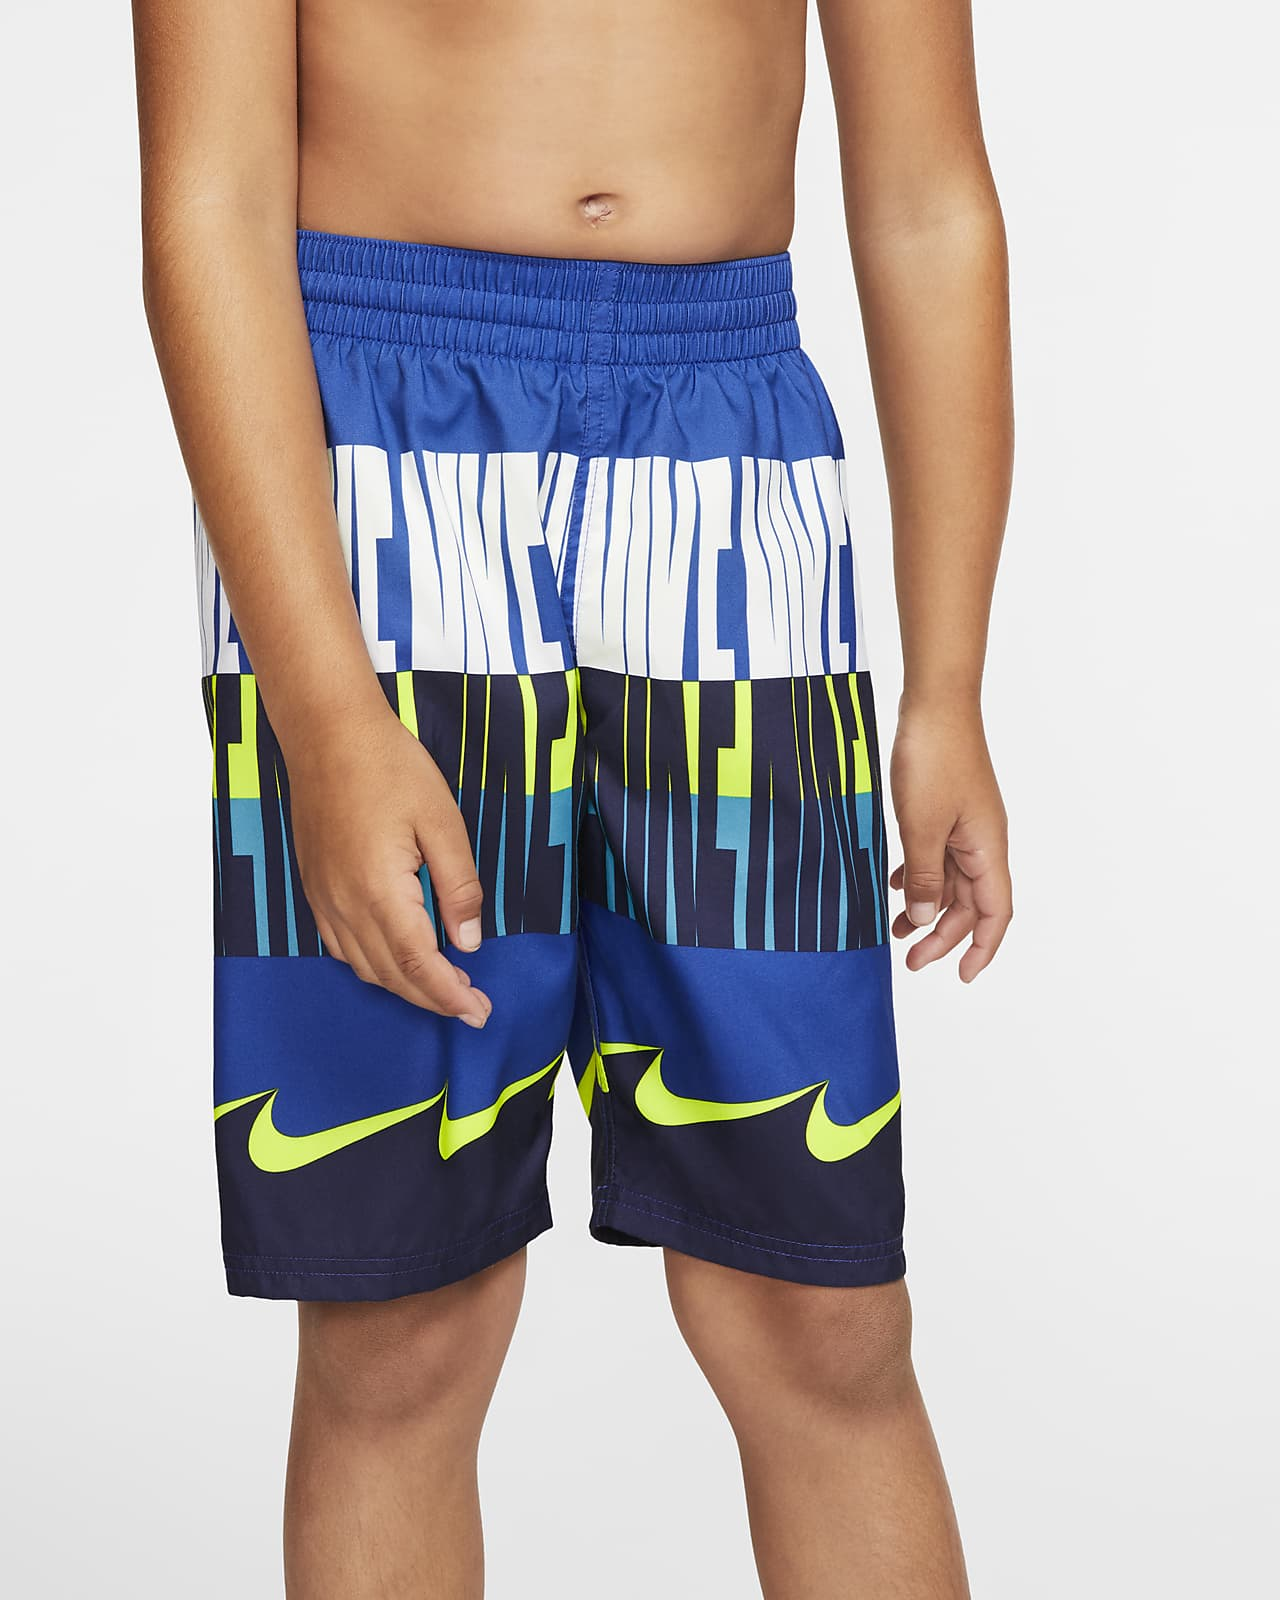 Nike Clash Breaker Older Kids' (Boys') 20cm (approx.) Volleyball Shorts